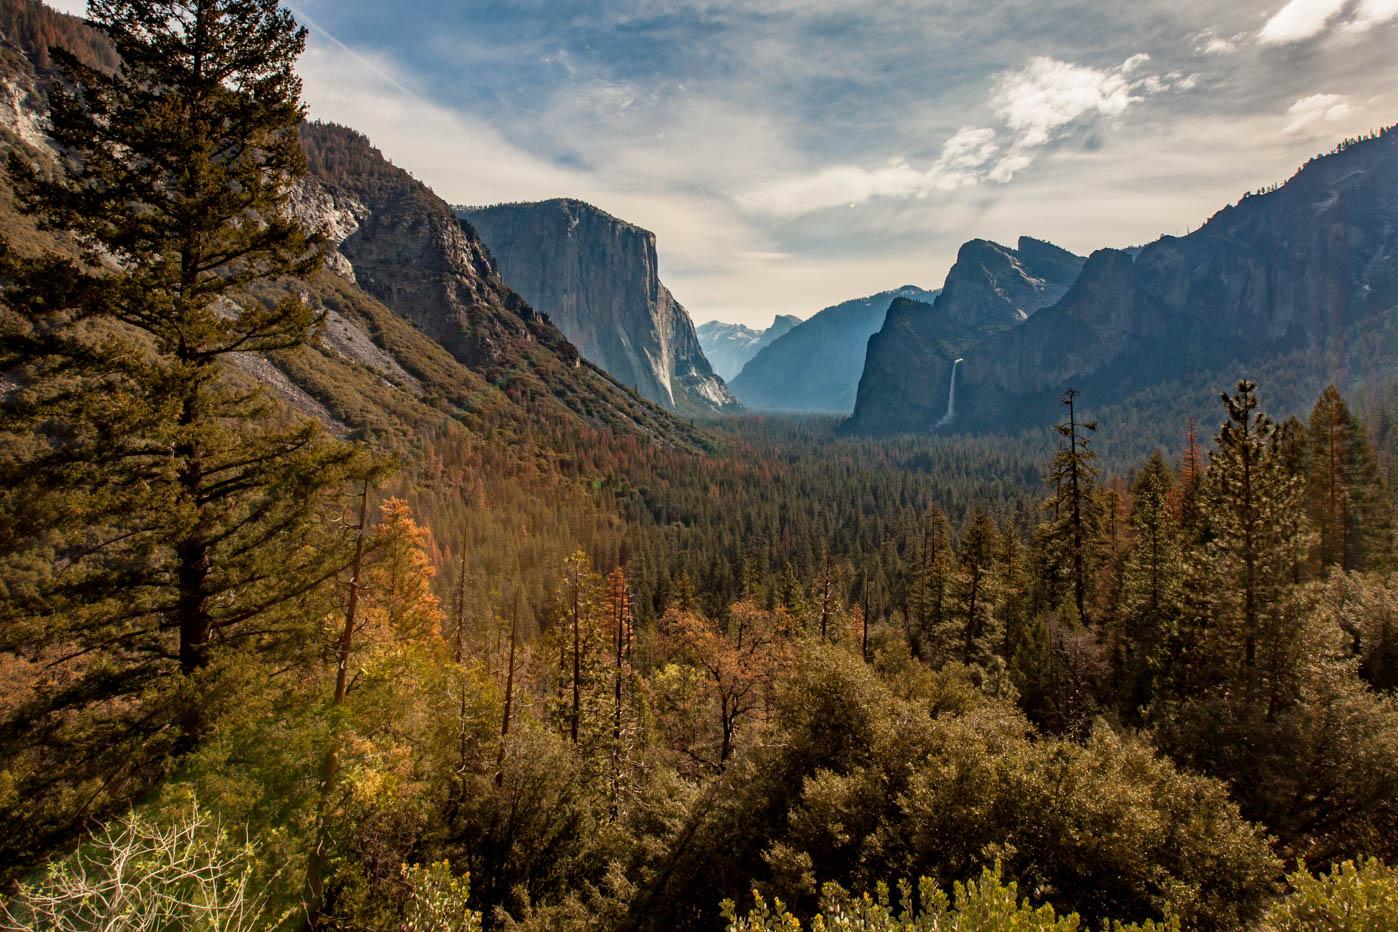 Tunnel View Best Photo Spots Yosemite National Park #vezzaniphotography